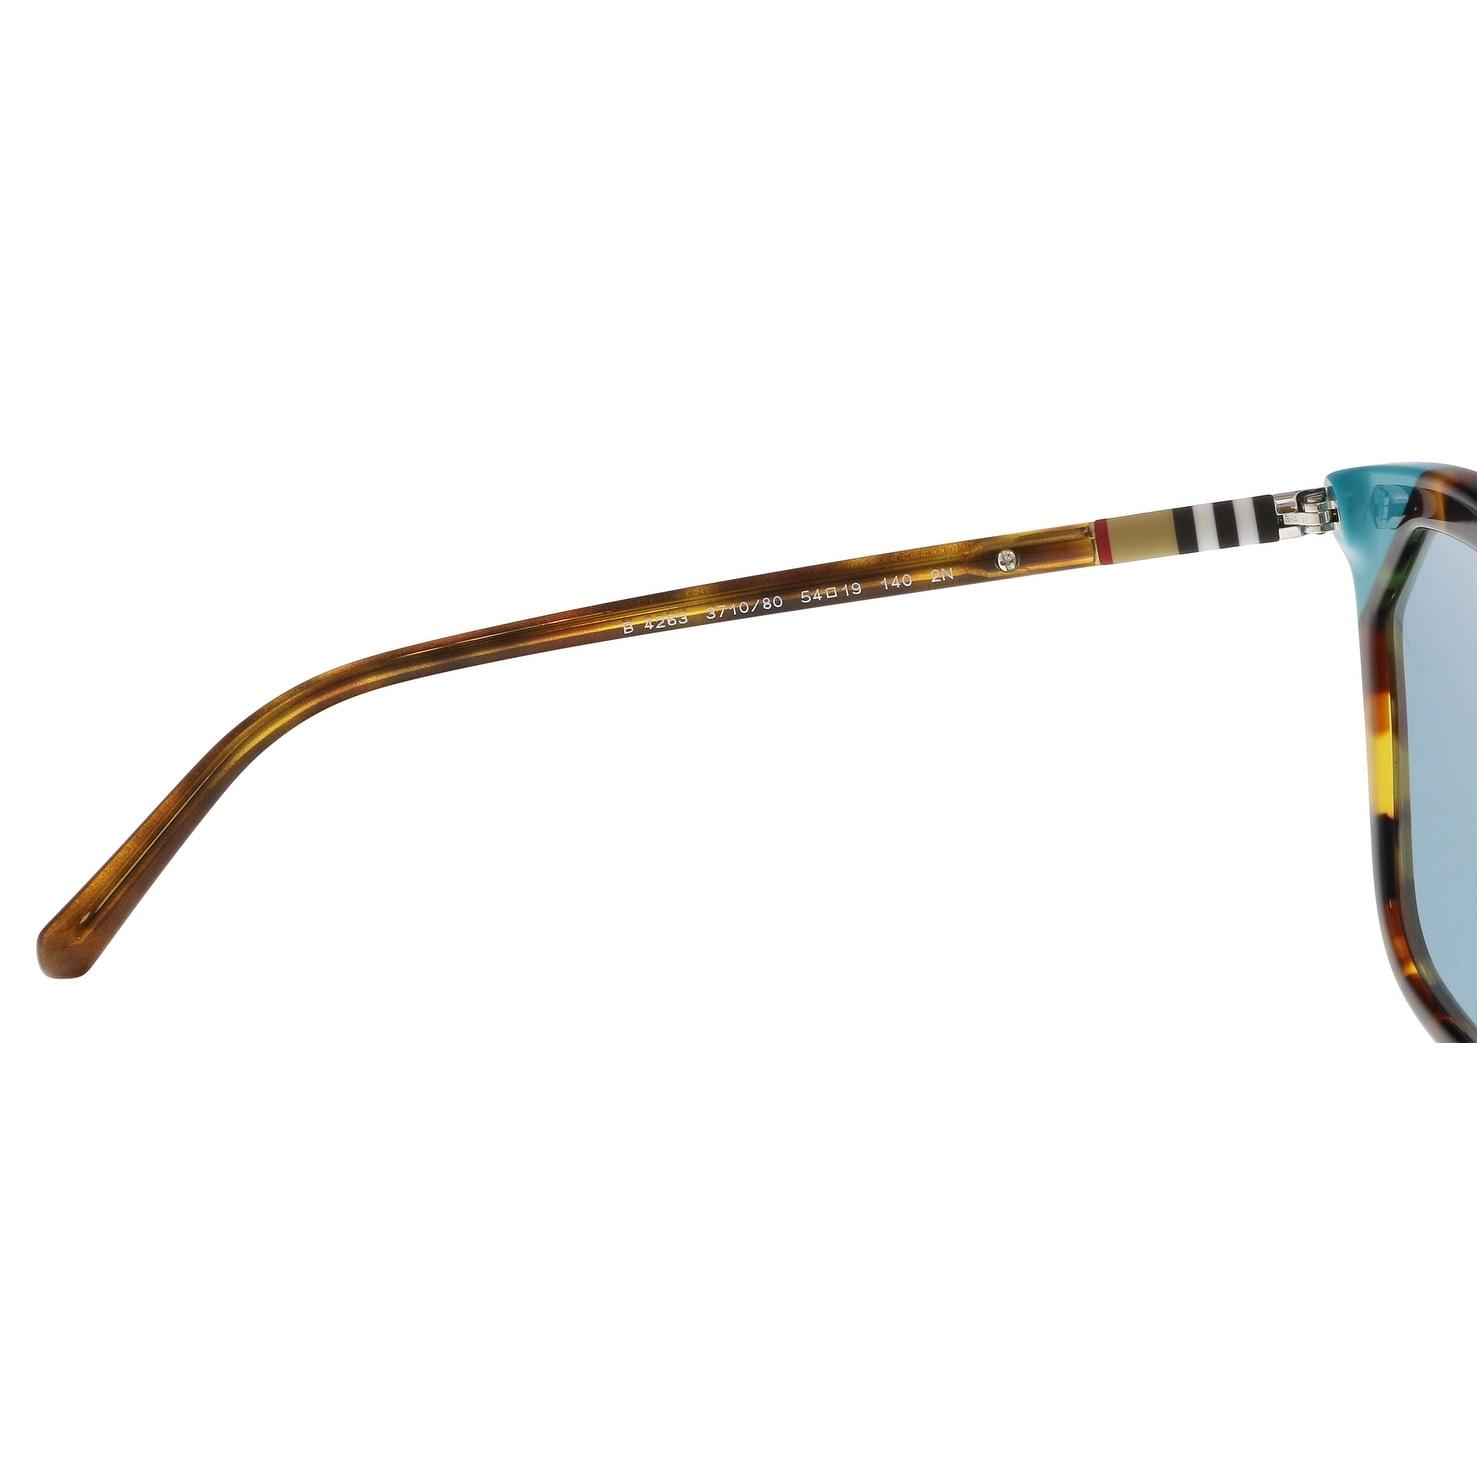 3edb1fffc99 Shop Burberry BE4263 371080 Brown havana azure Butterfly Sunglasses -  54-19-140 - Free Shipping Today - Overstock.com - 21157916